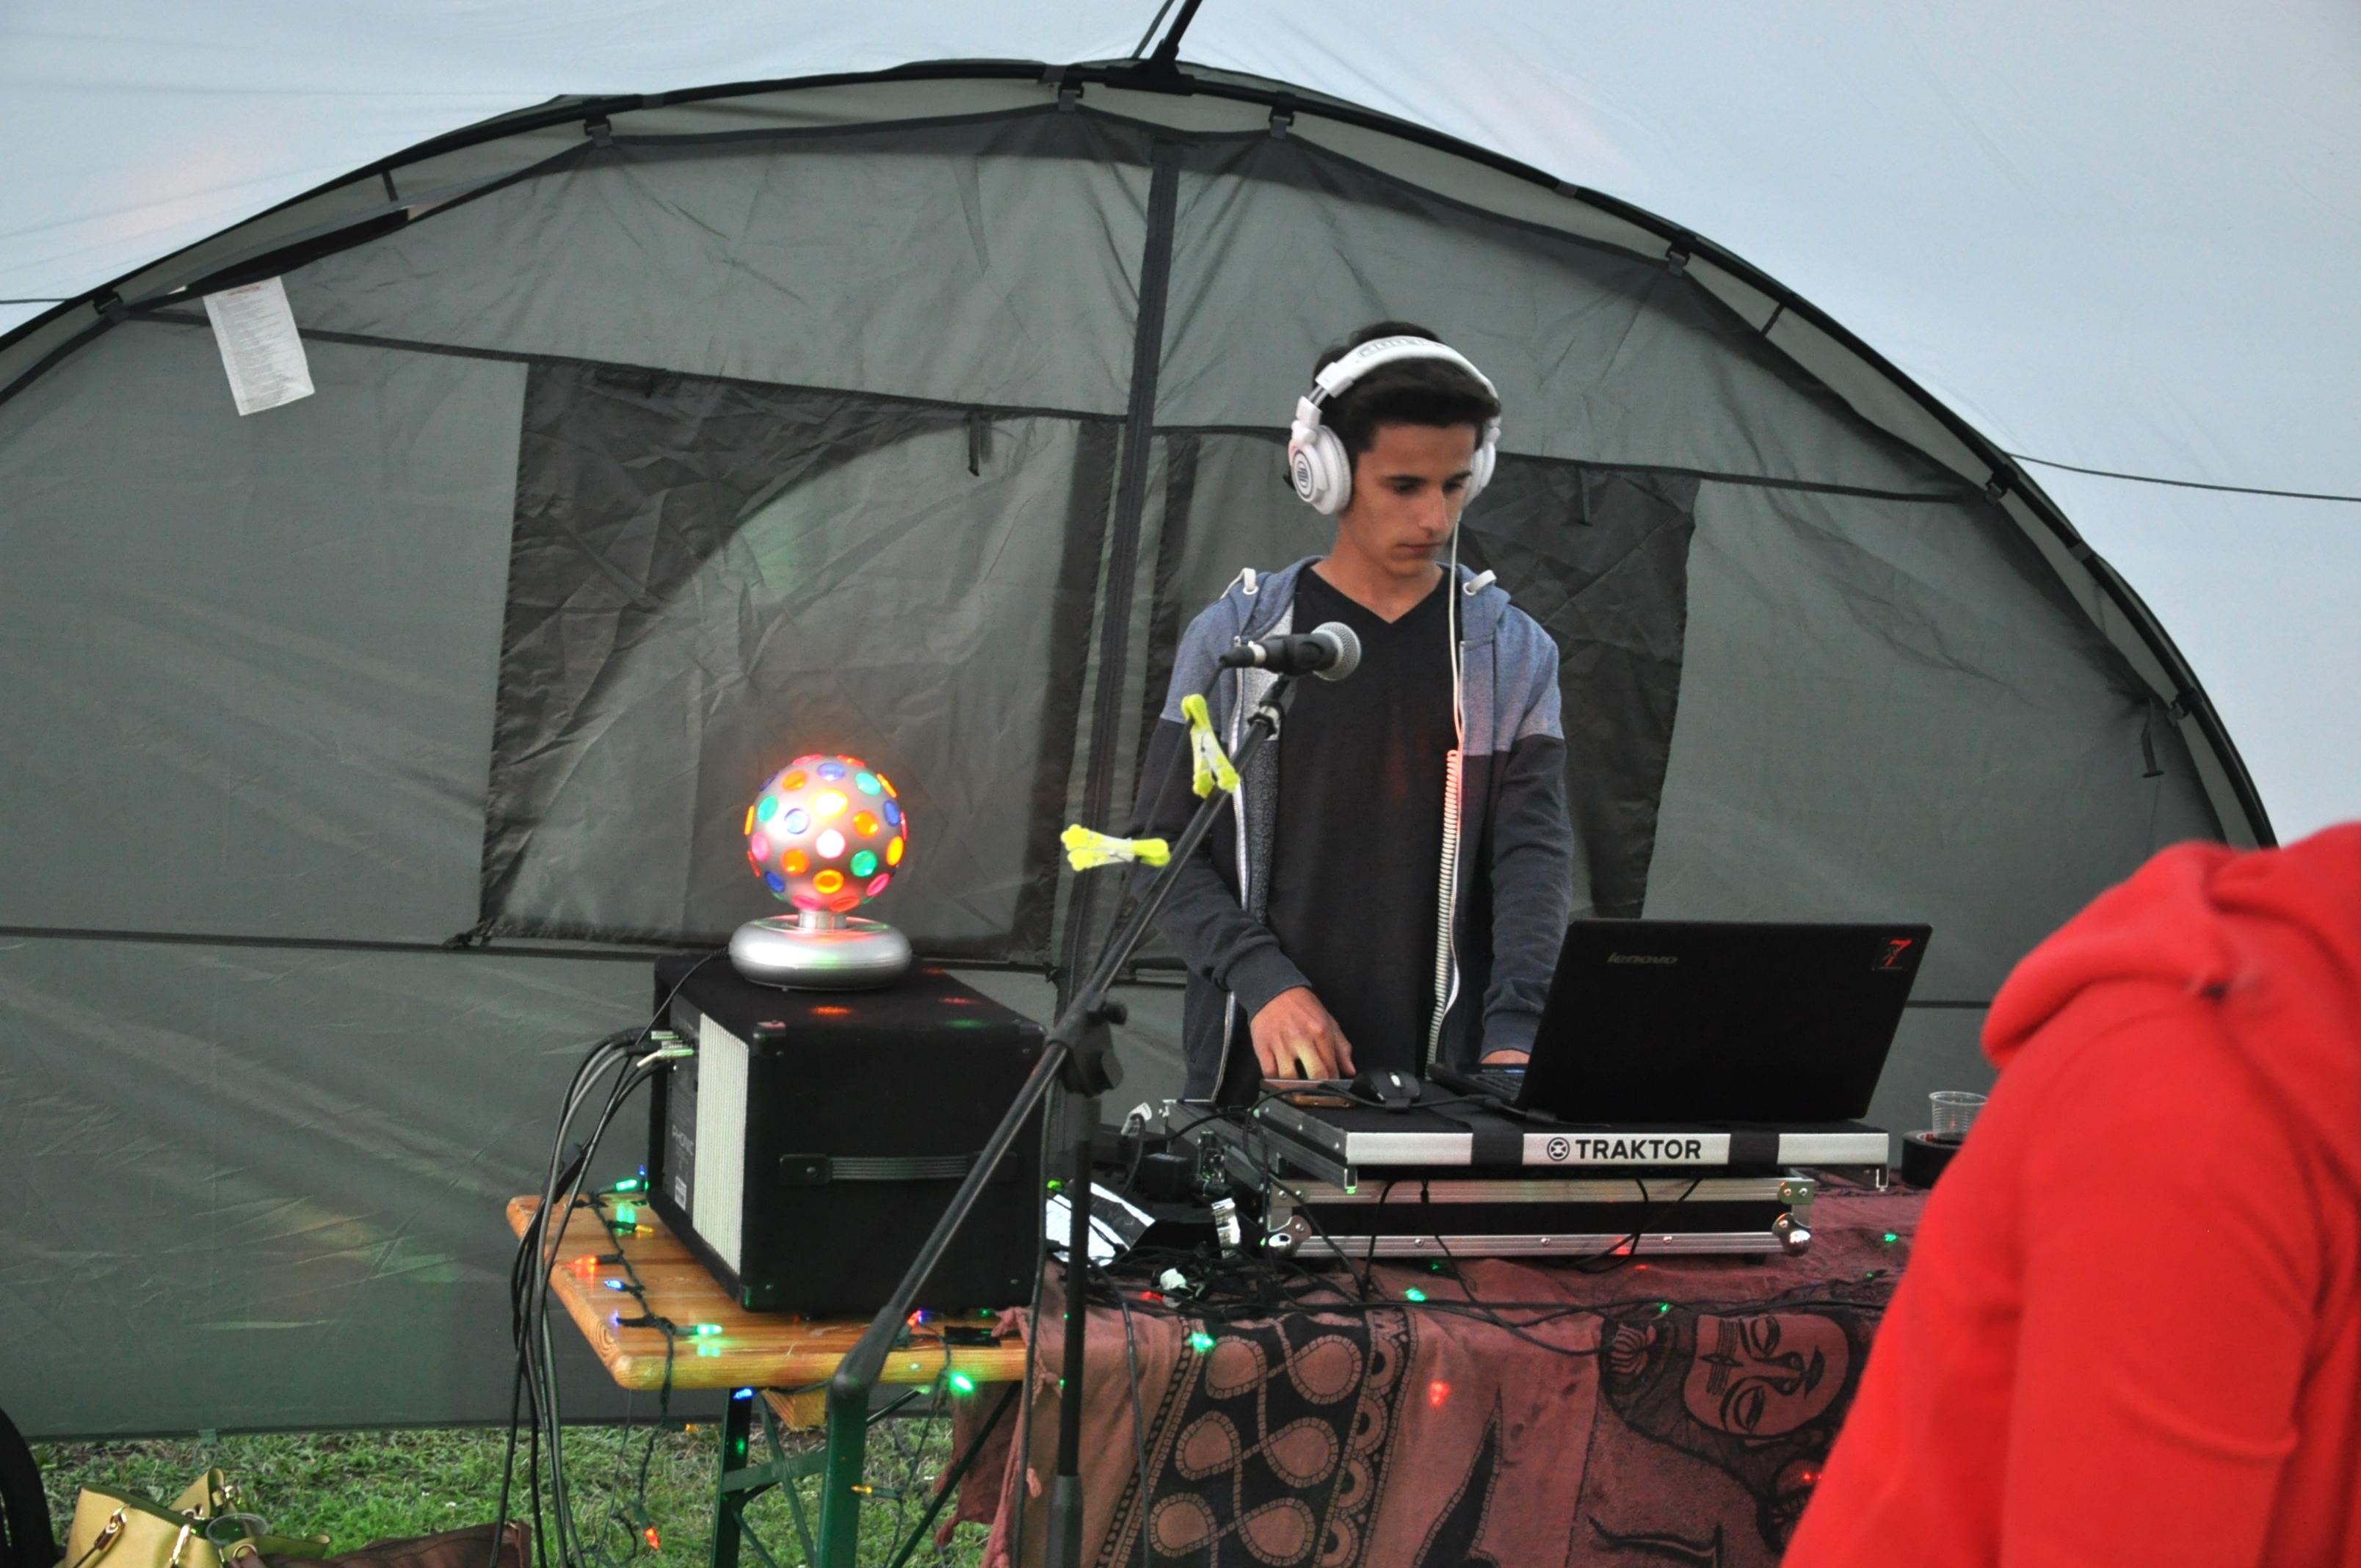 Ey DJ! -